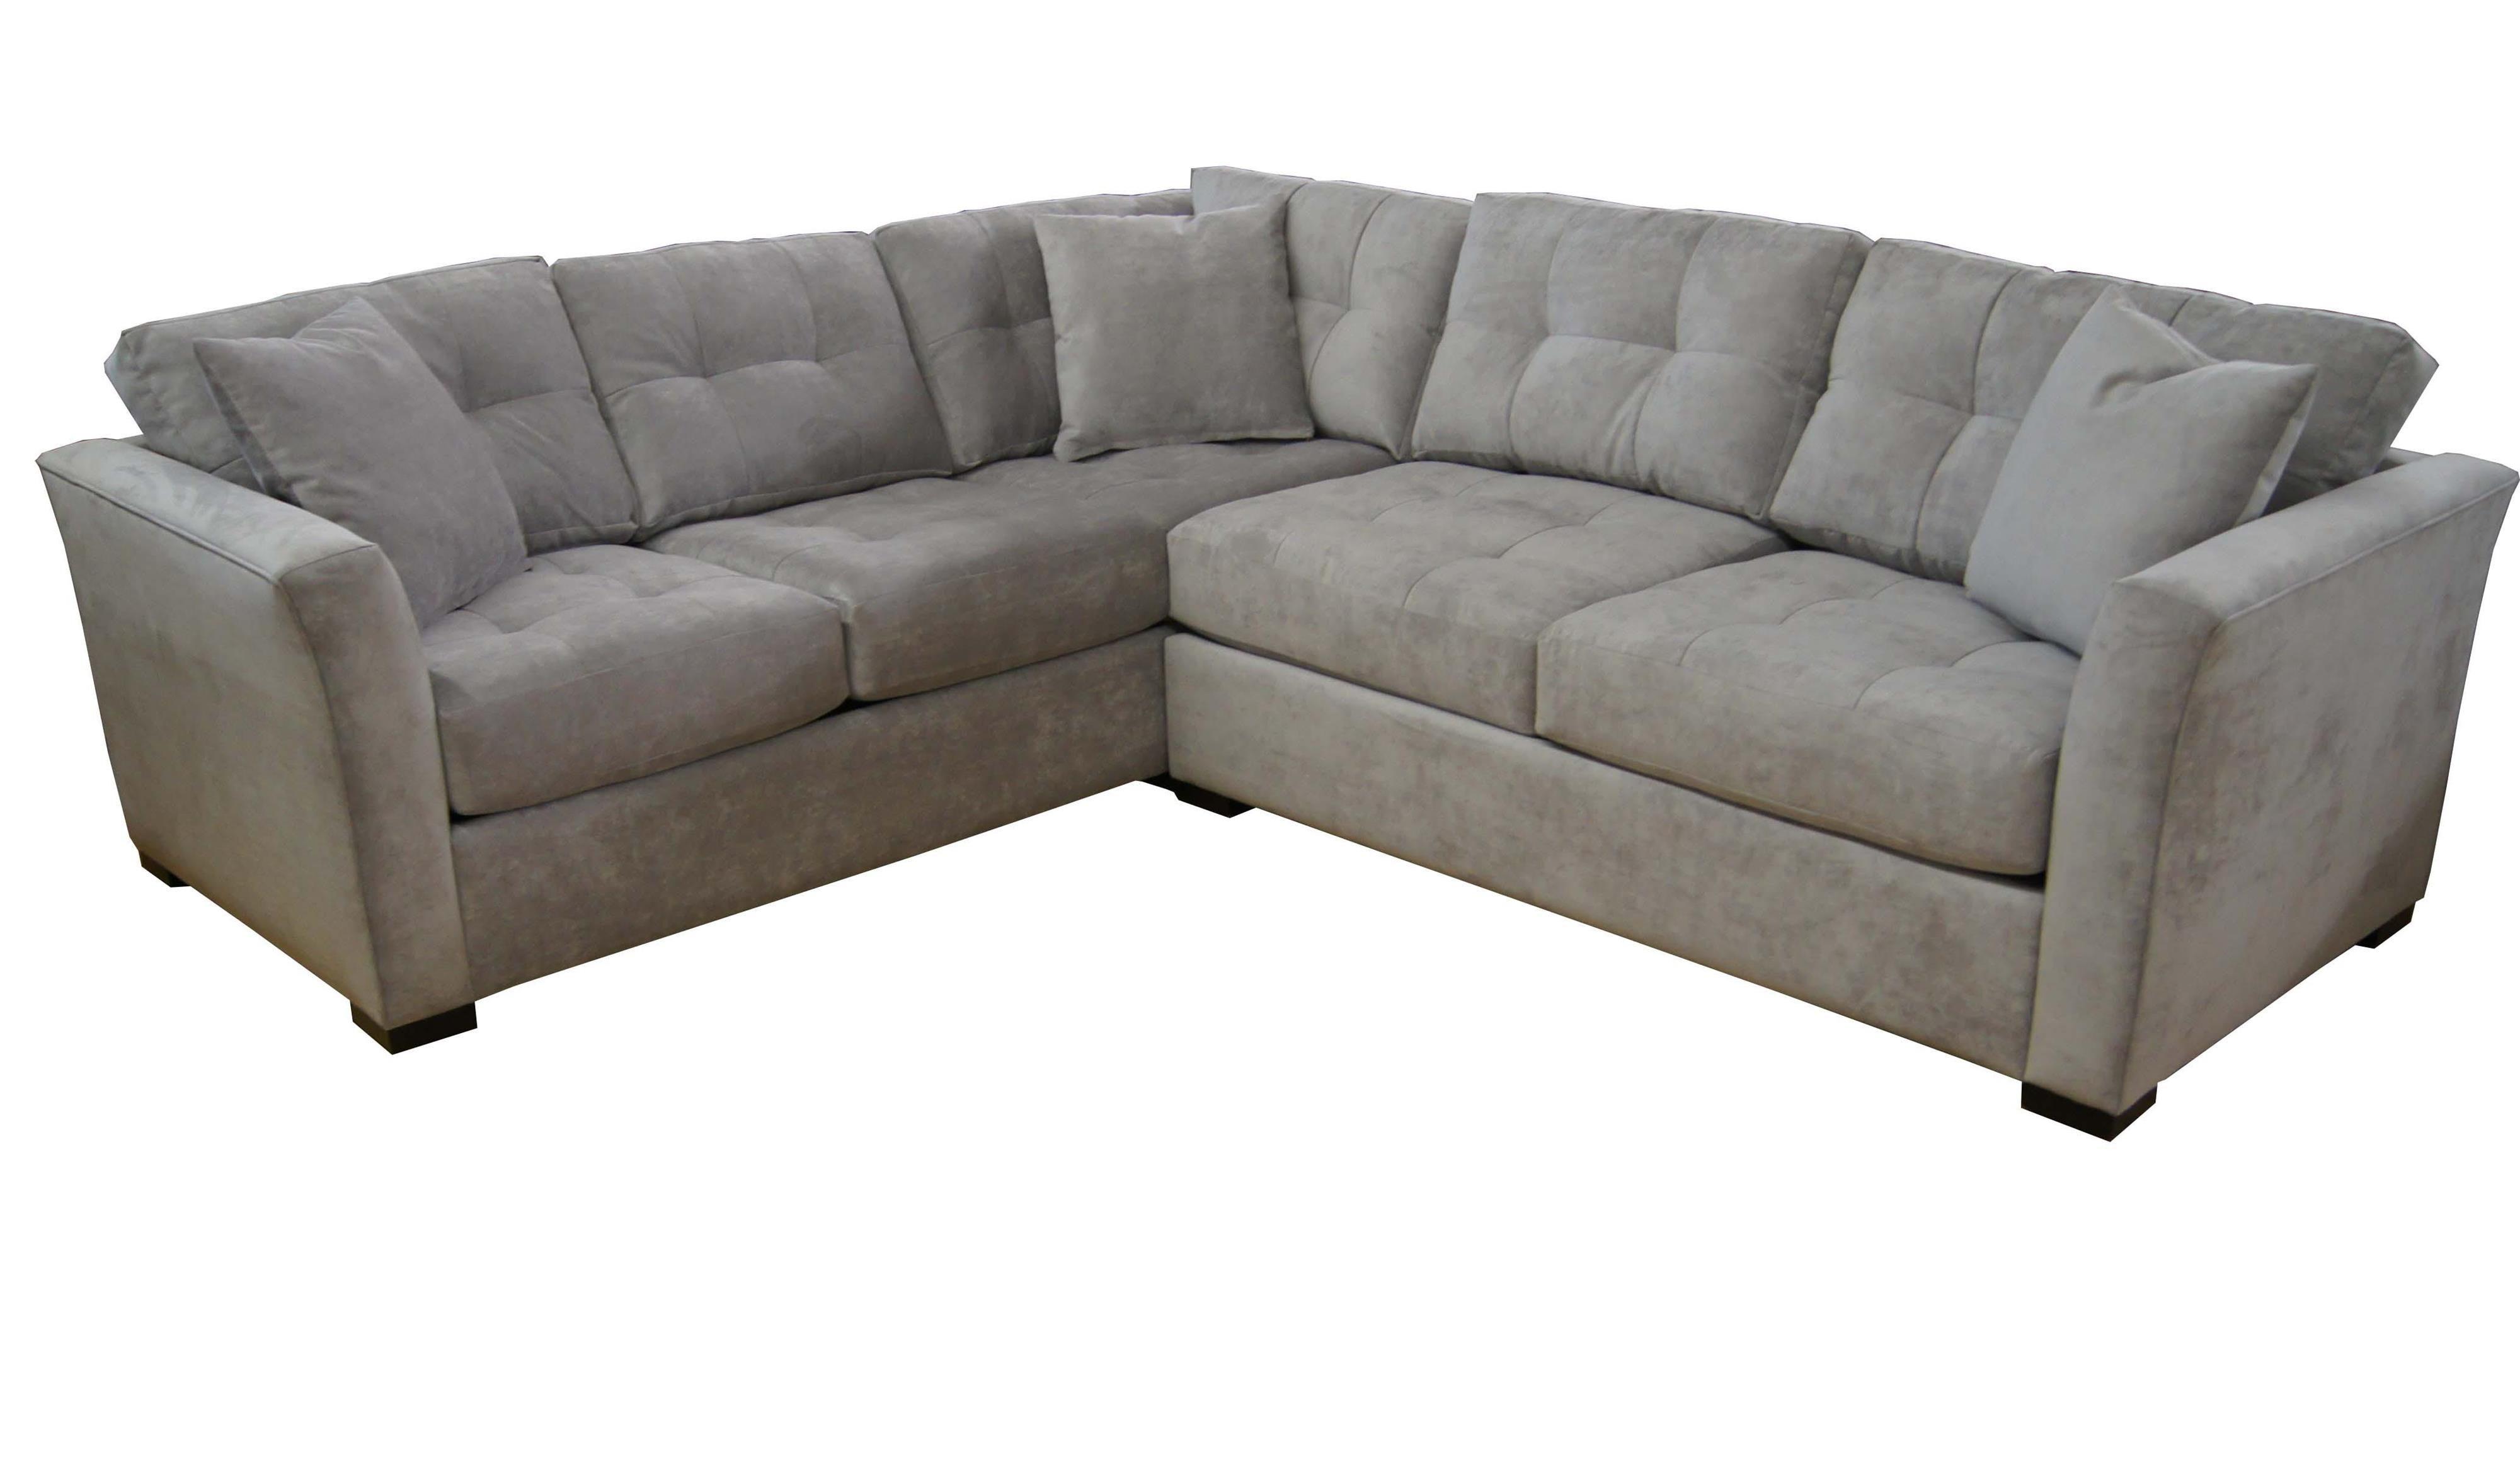 Narrow Depth Sectional Sofa